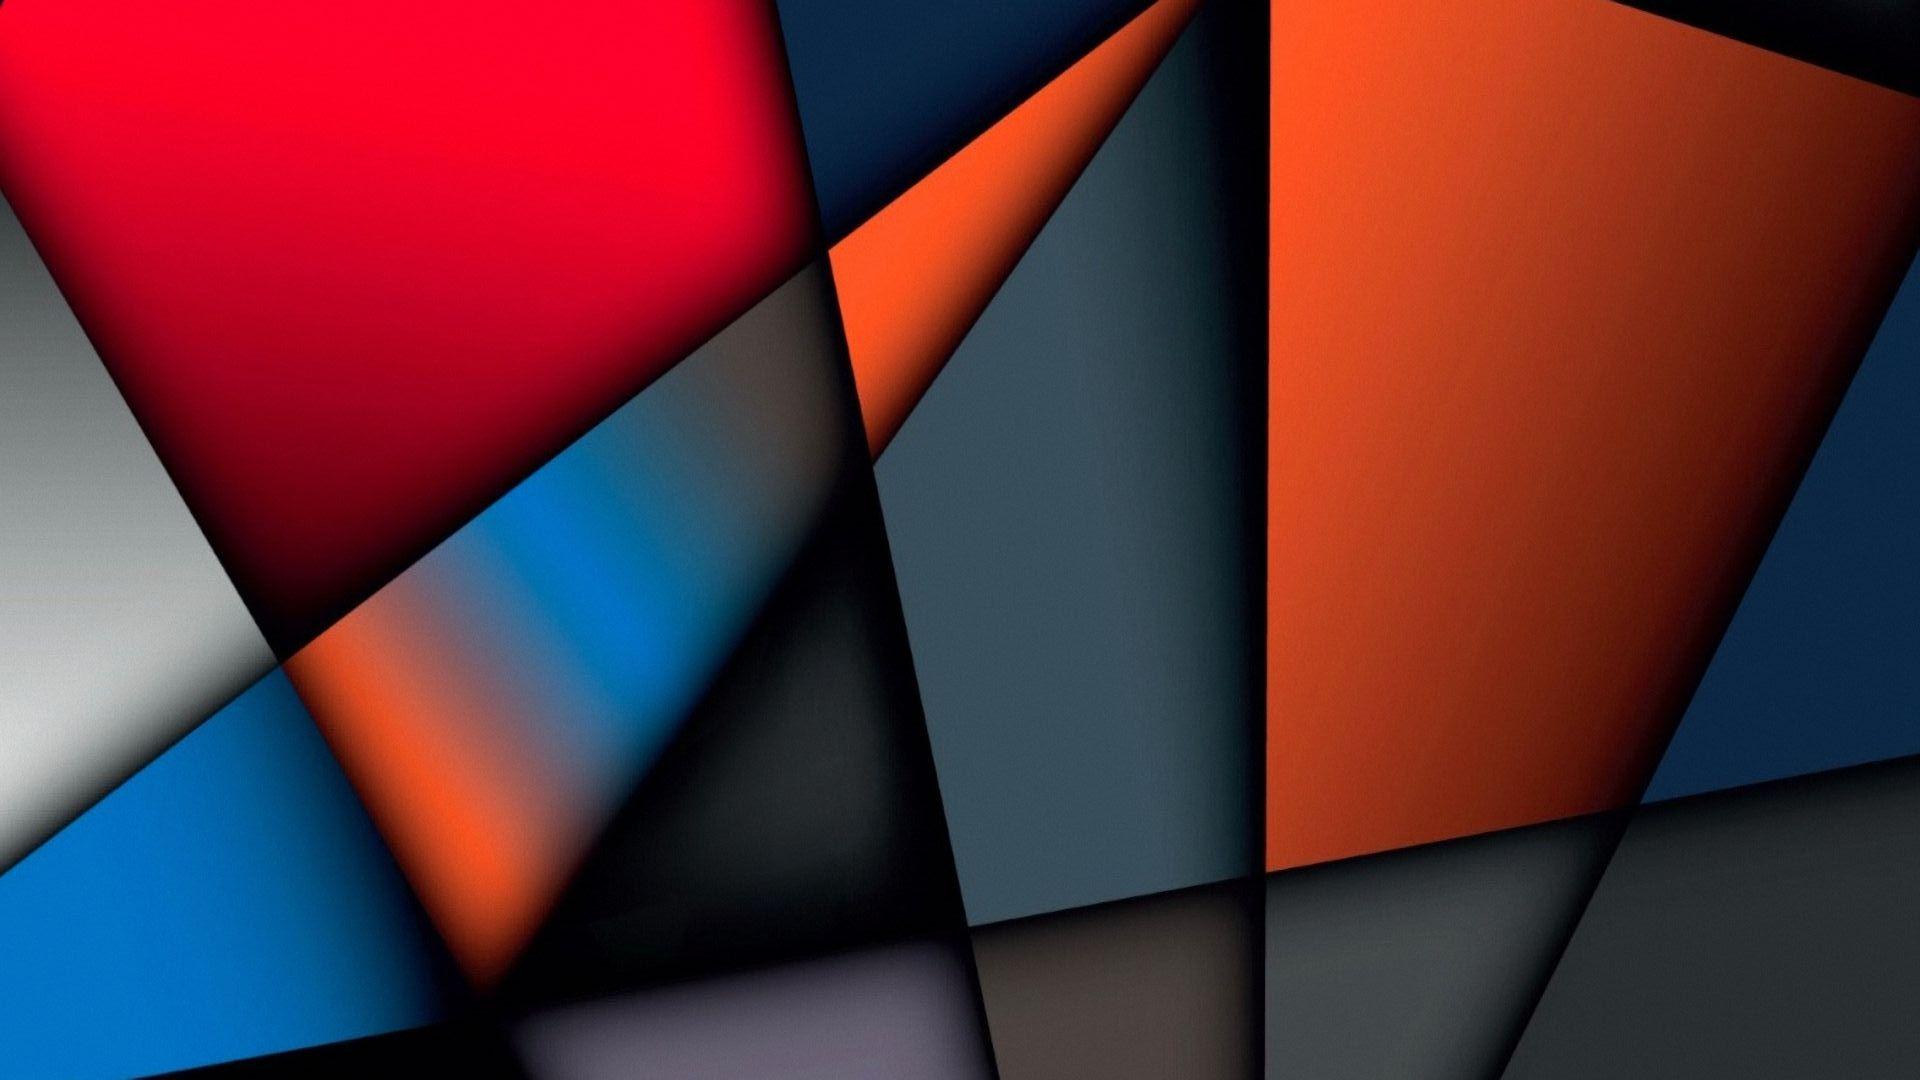 Abstract Desktop Wallpaper 2020 Live Wallpaper Hd Best Wallpaper Hd Desktop Wallpaper Wallpaper